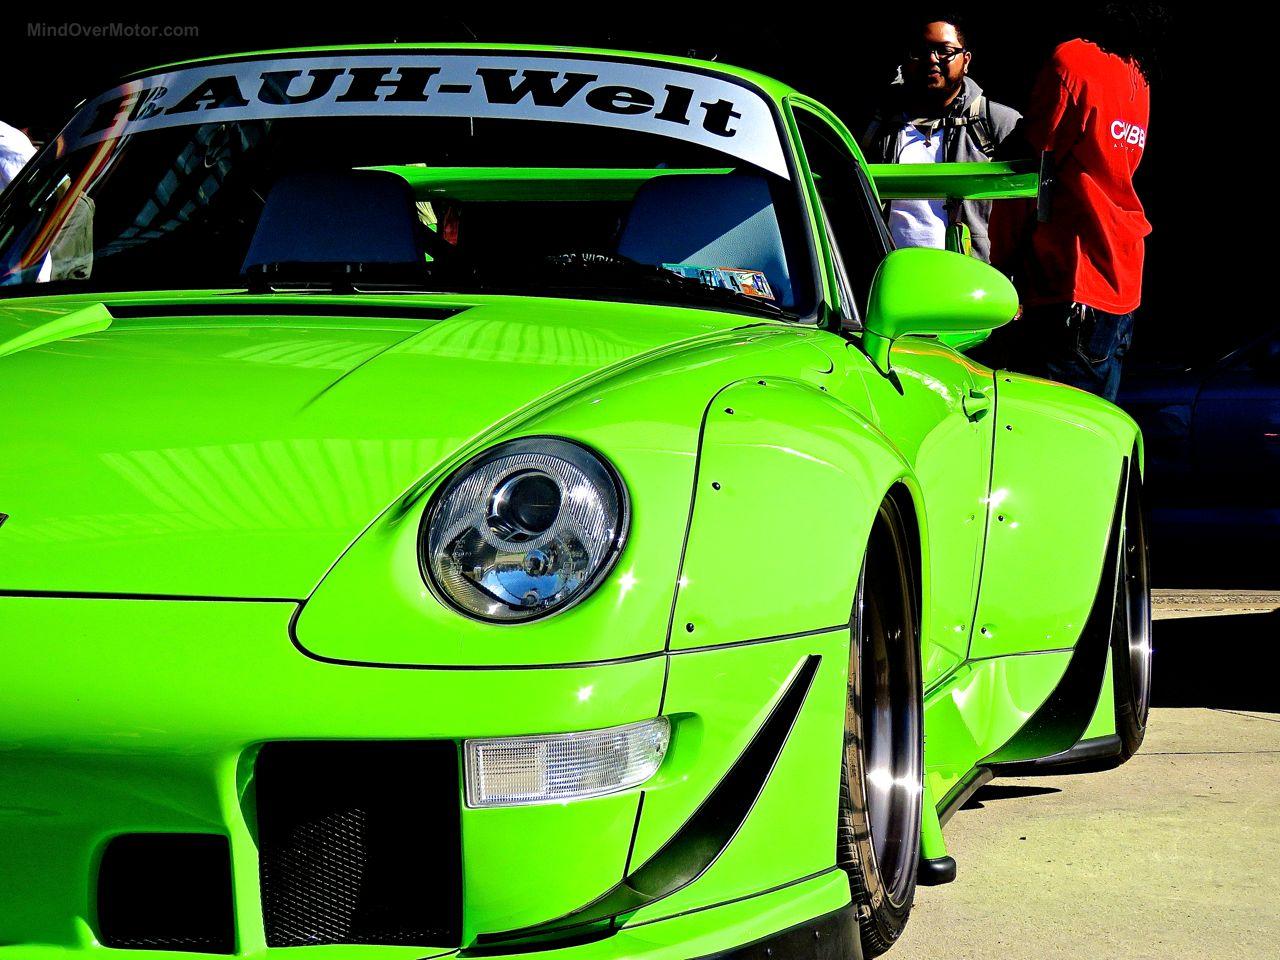 RWB Porsche 993 Philly 4